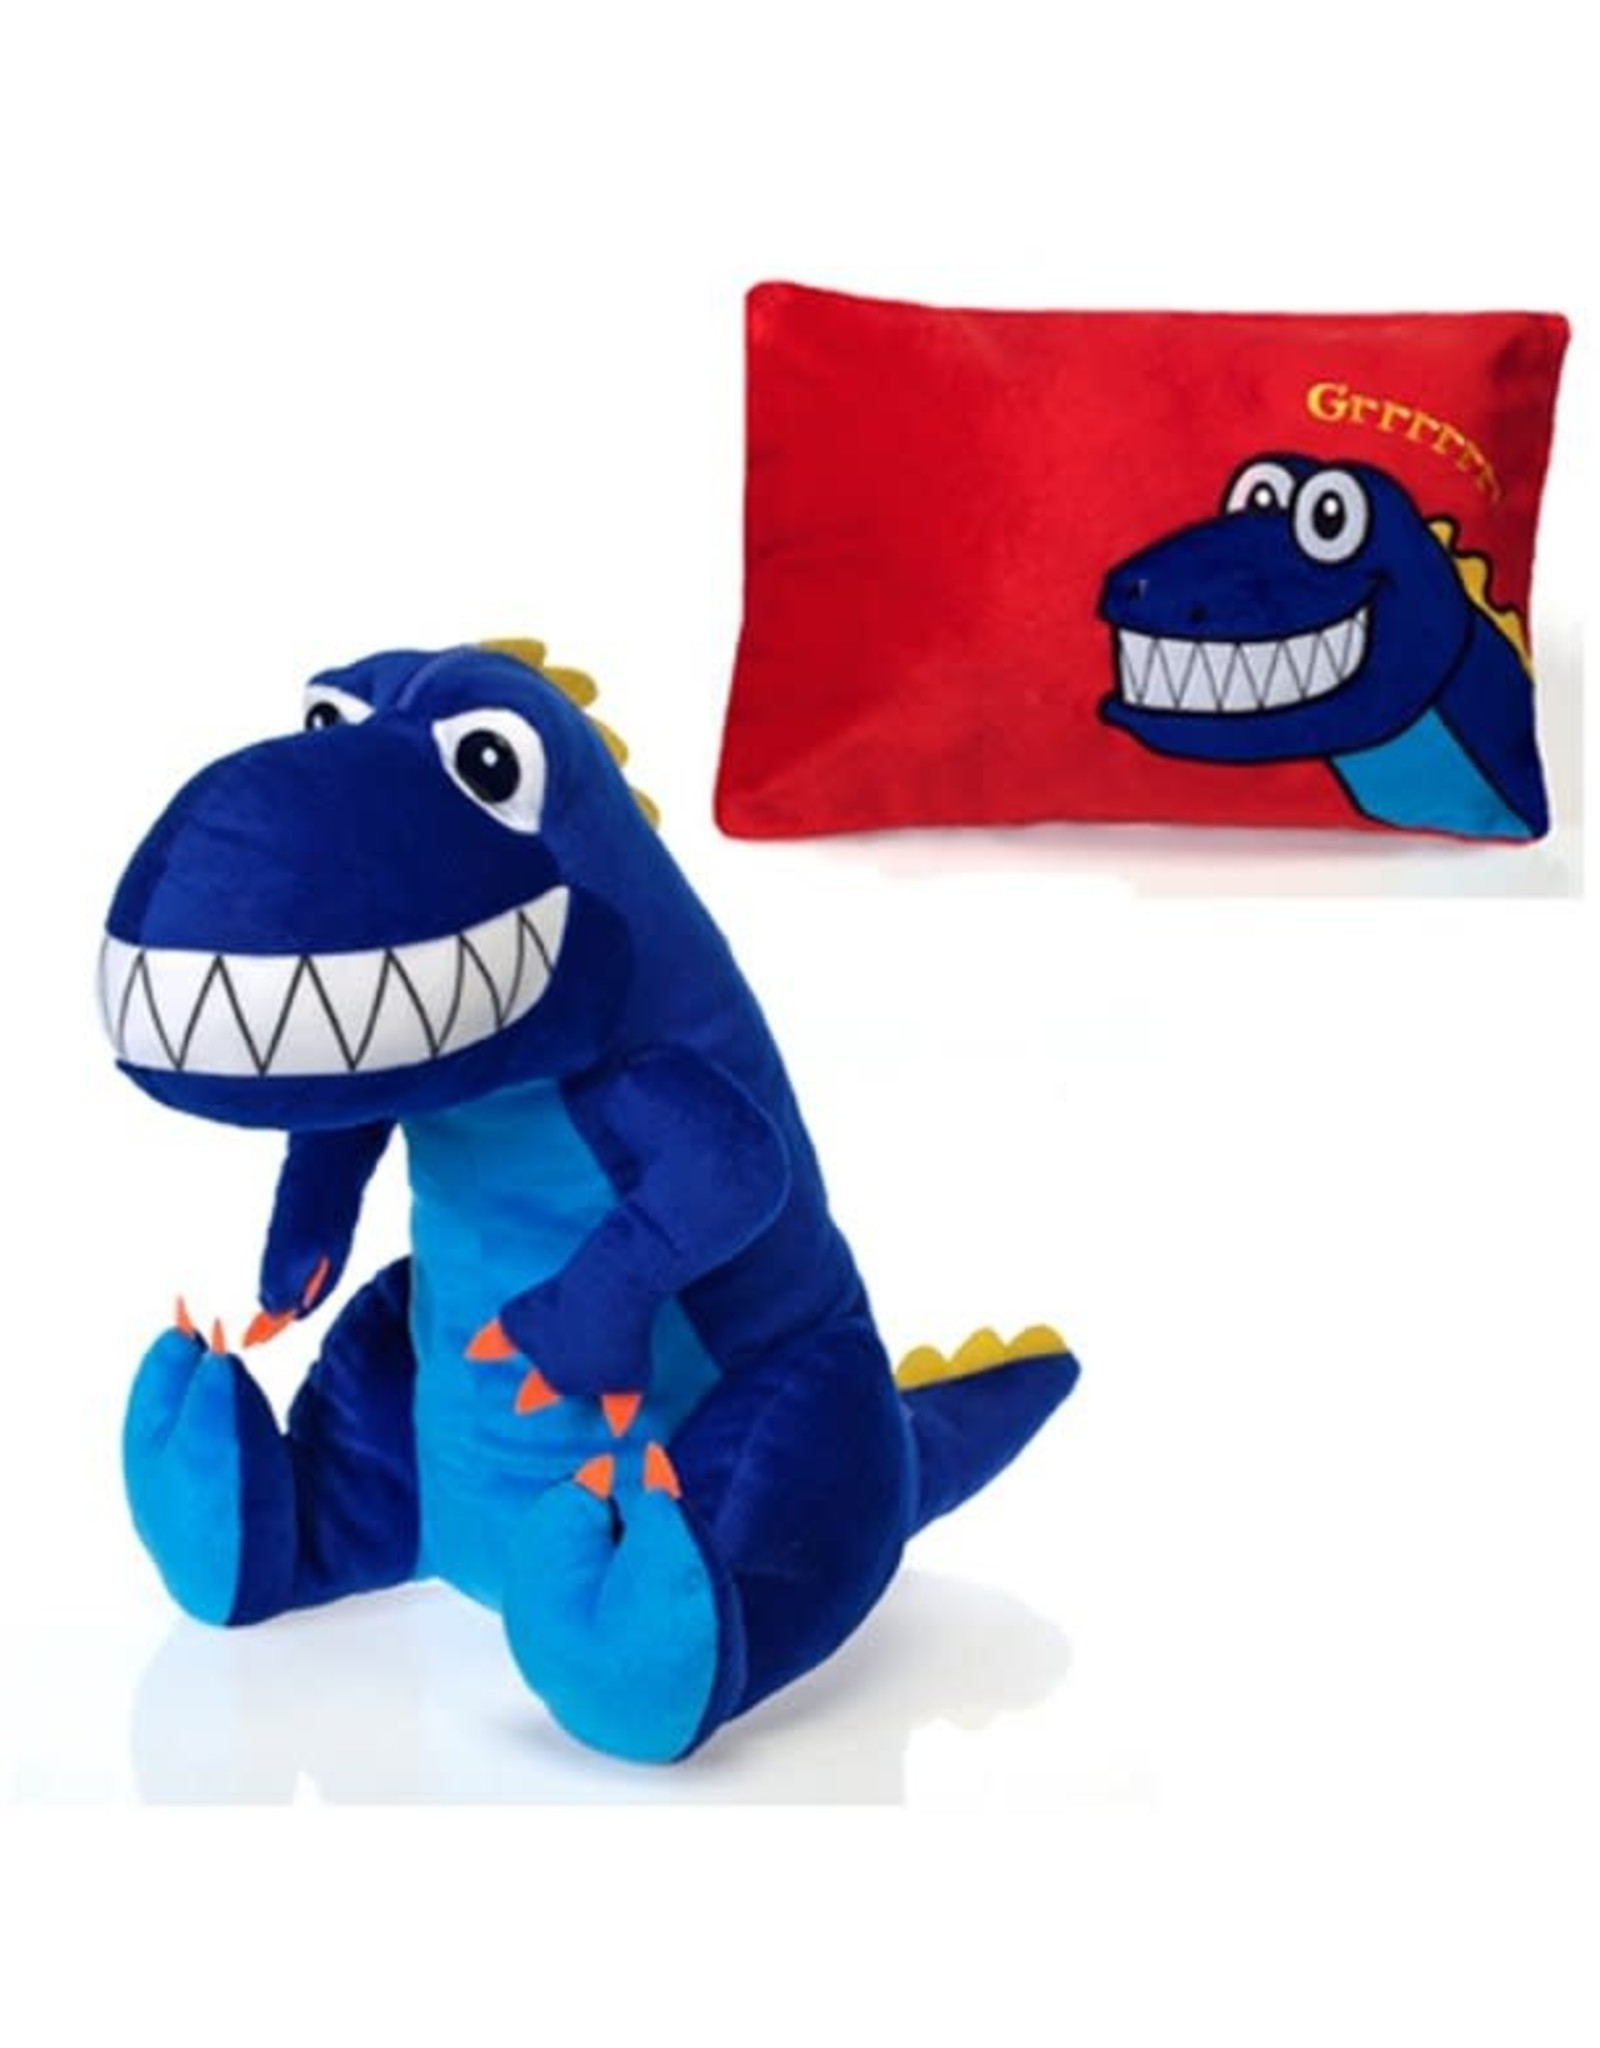 Peek-a-Boo Plush - dinosaur pillow